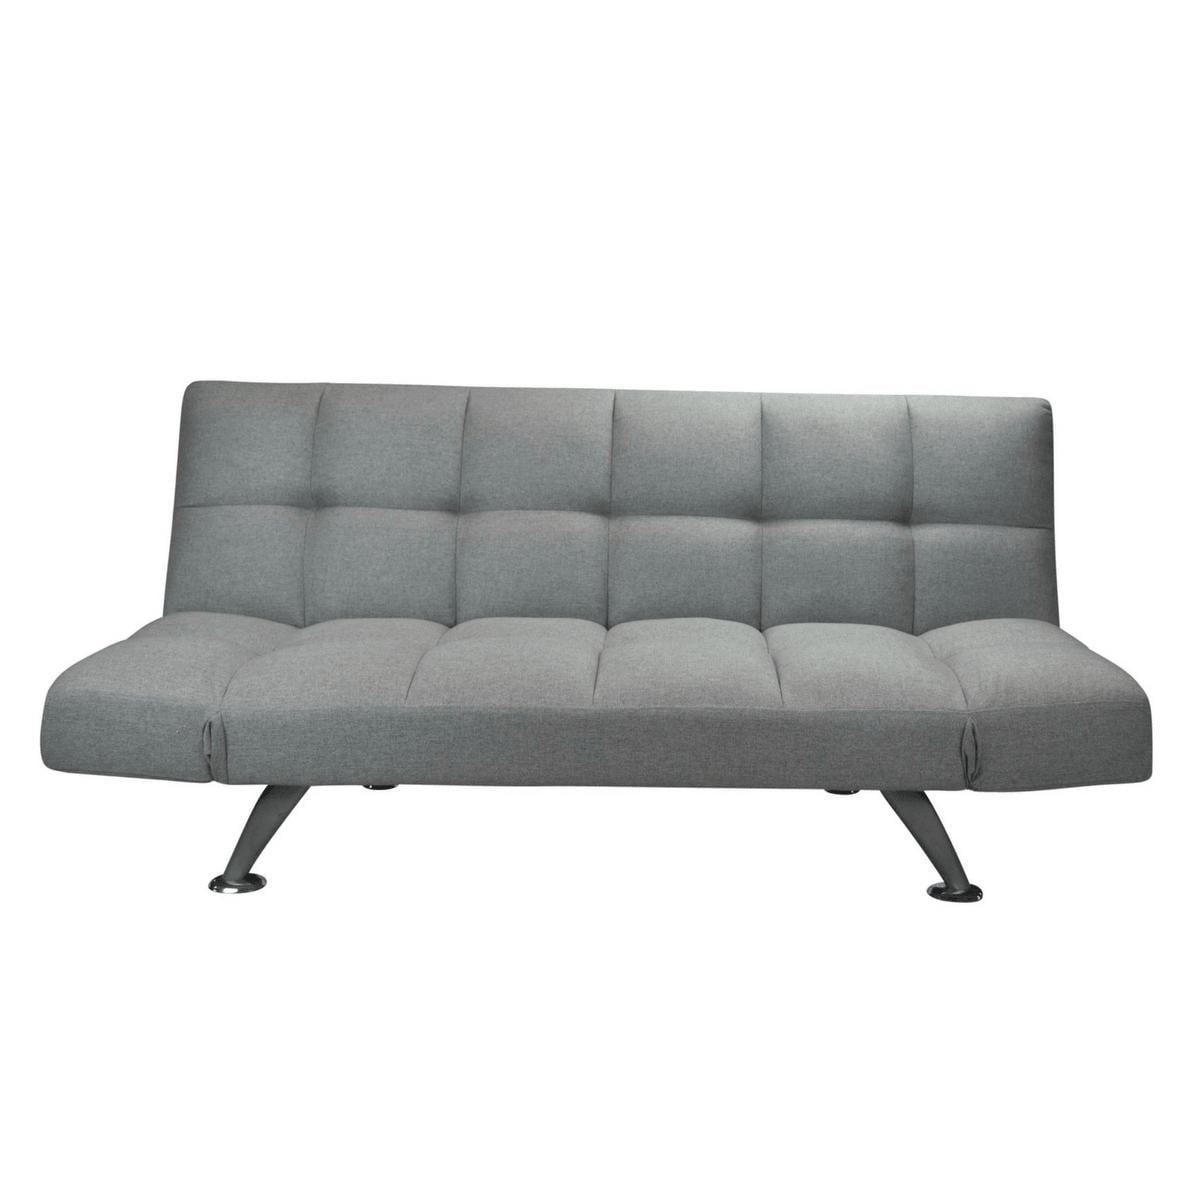 Brandon Sofa Bed